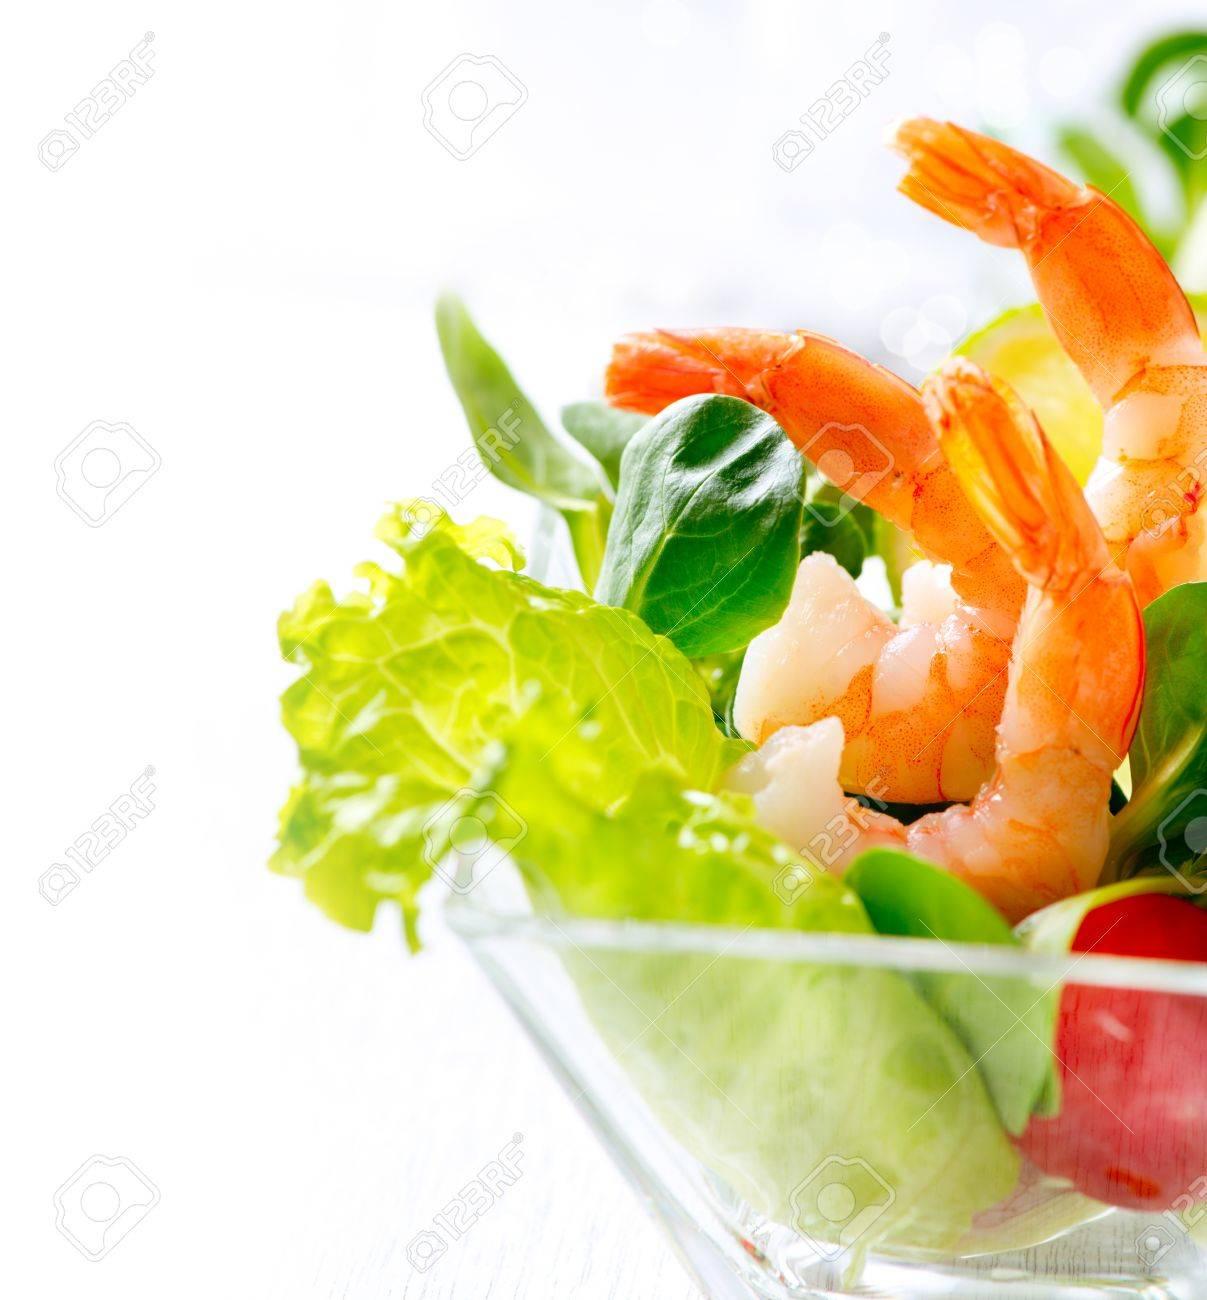 Shrimp or Prawn Cocktail  Isolated on White Stock Photo - 18892663